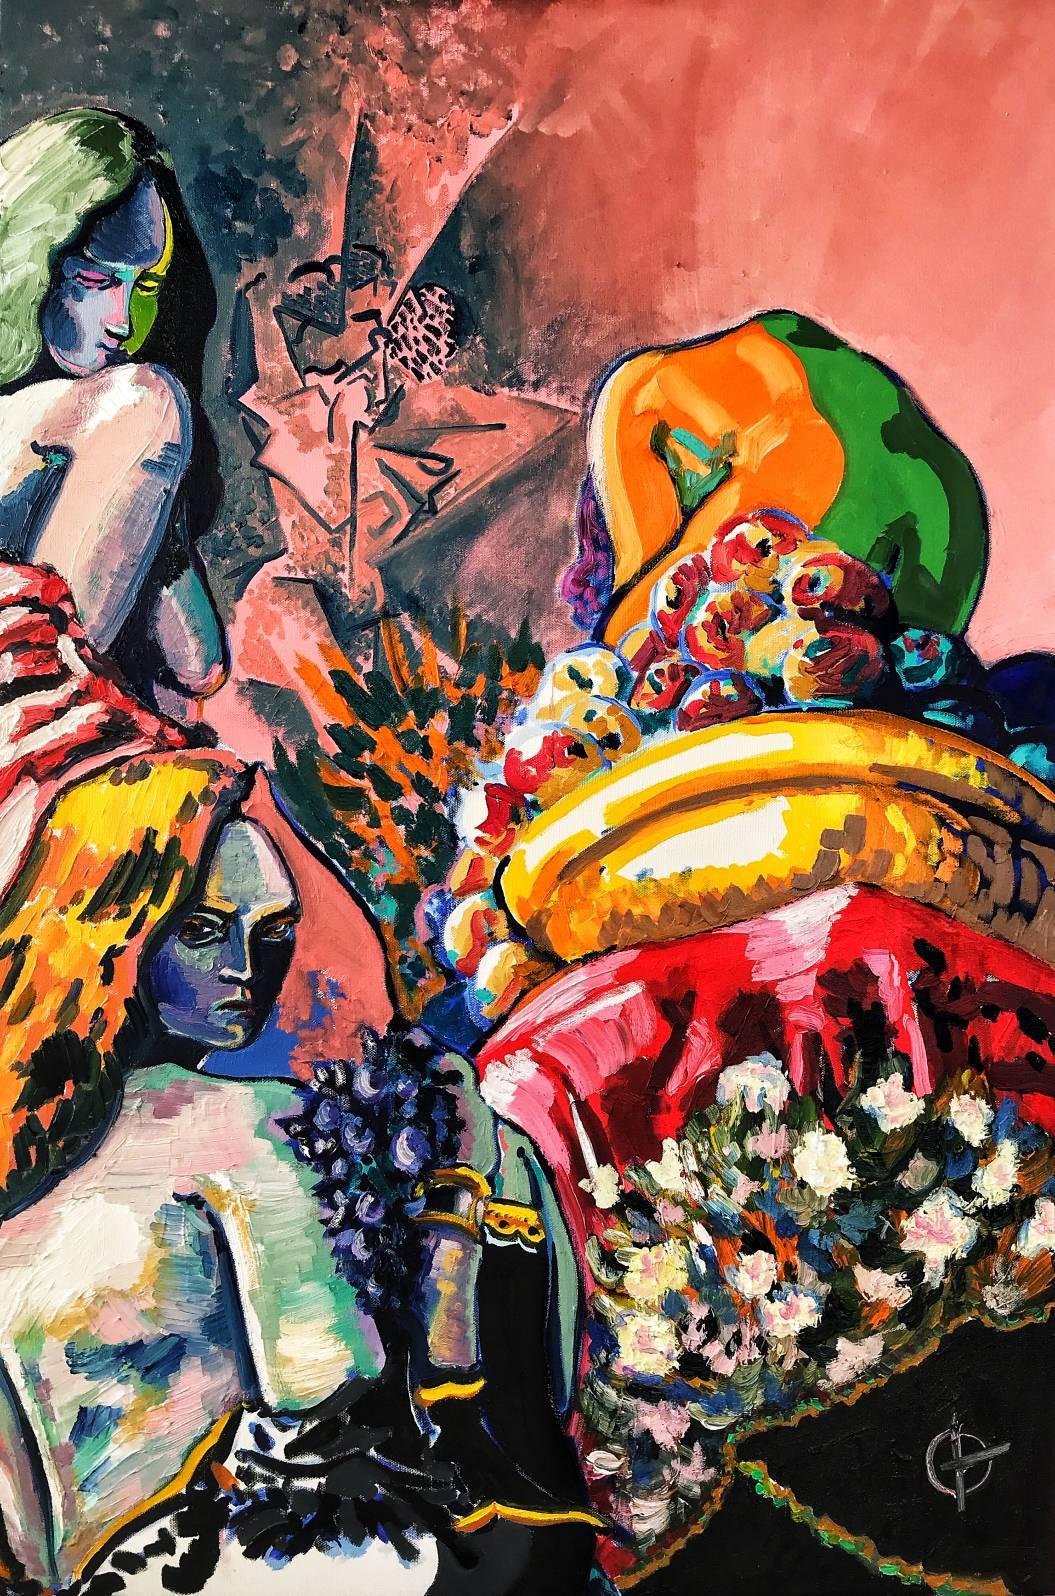 Fruits of Temptation (2018) - Christian Aguilar